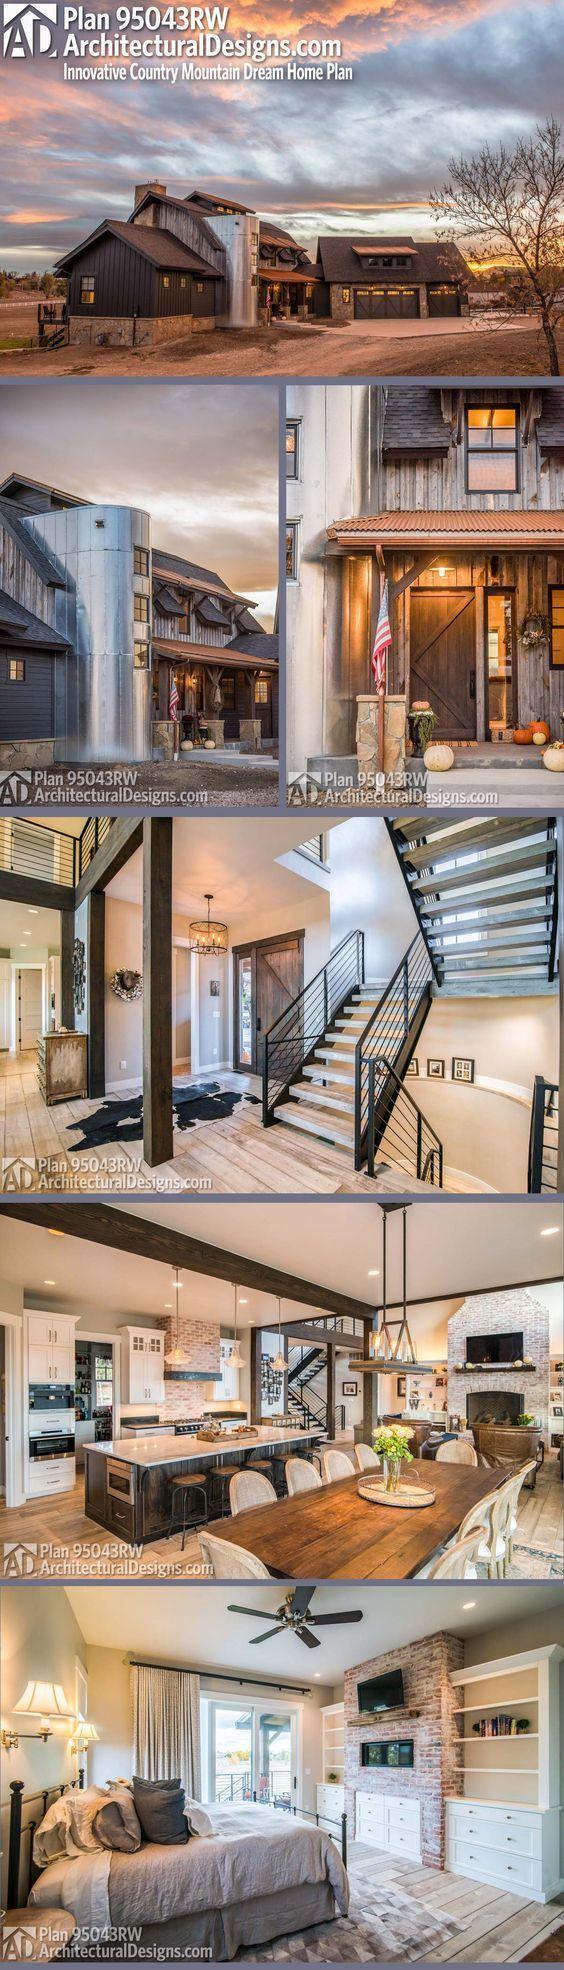 best House Remodeling images on Pinterest House remodeling